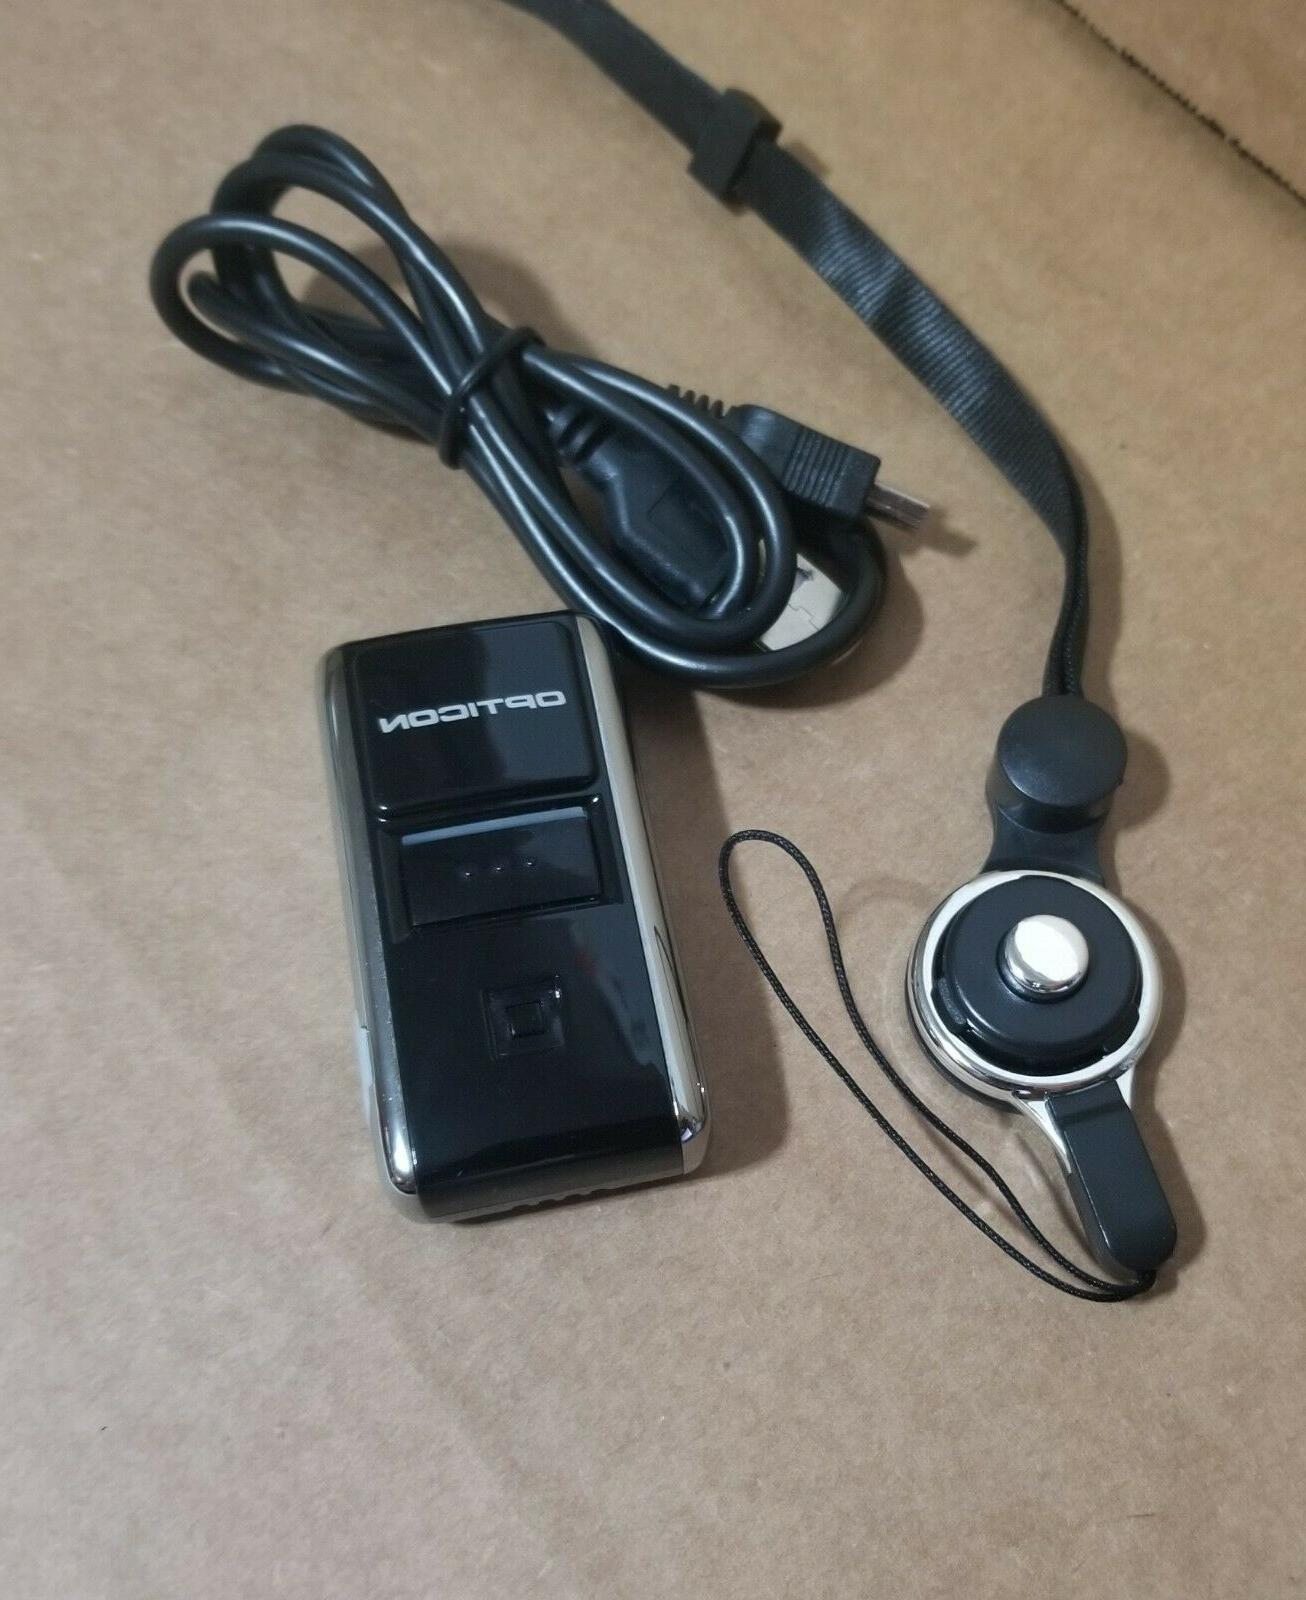 bluetooth wireless barcode scanner opn 2002n new